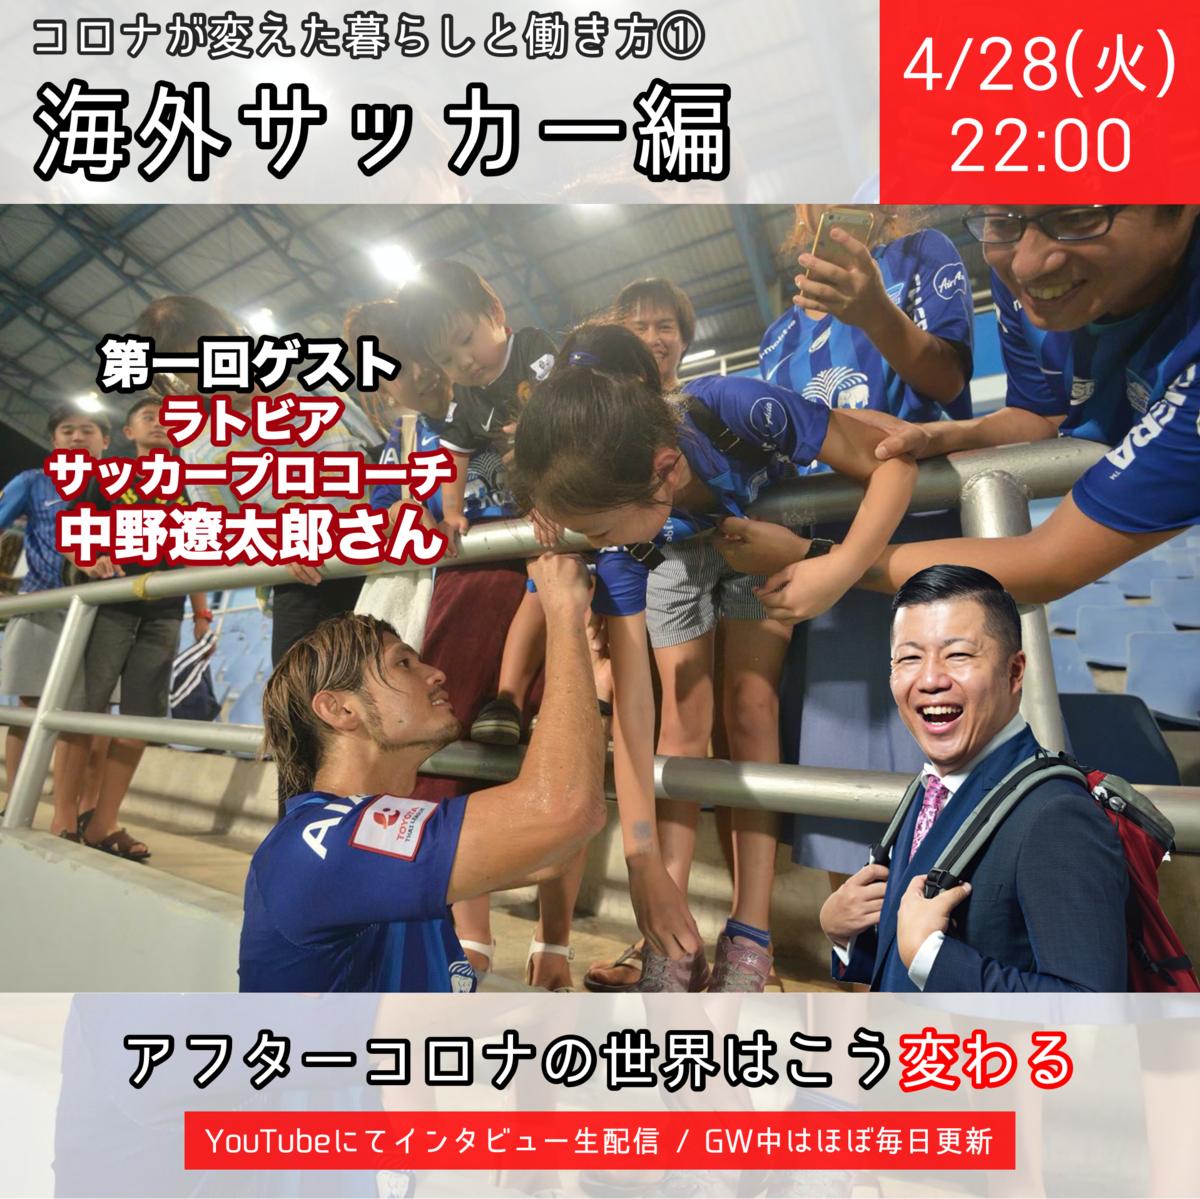 f:id:tomatsu1024:20200427193944p:plain